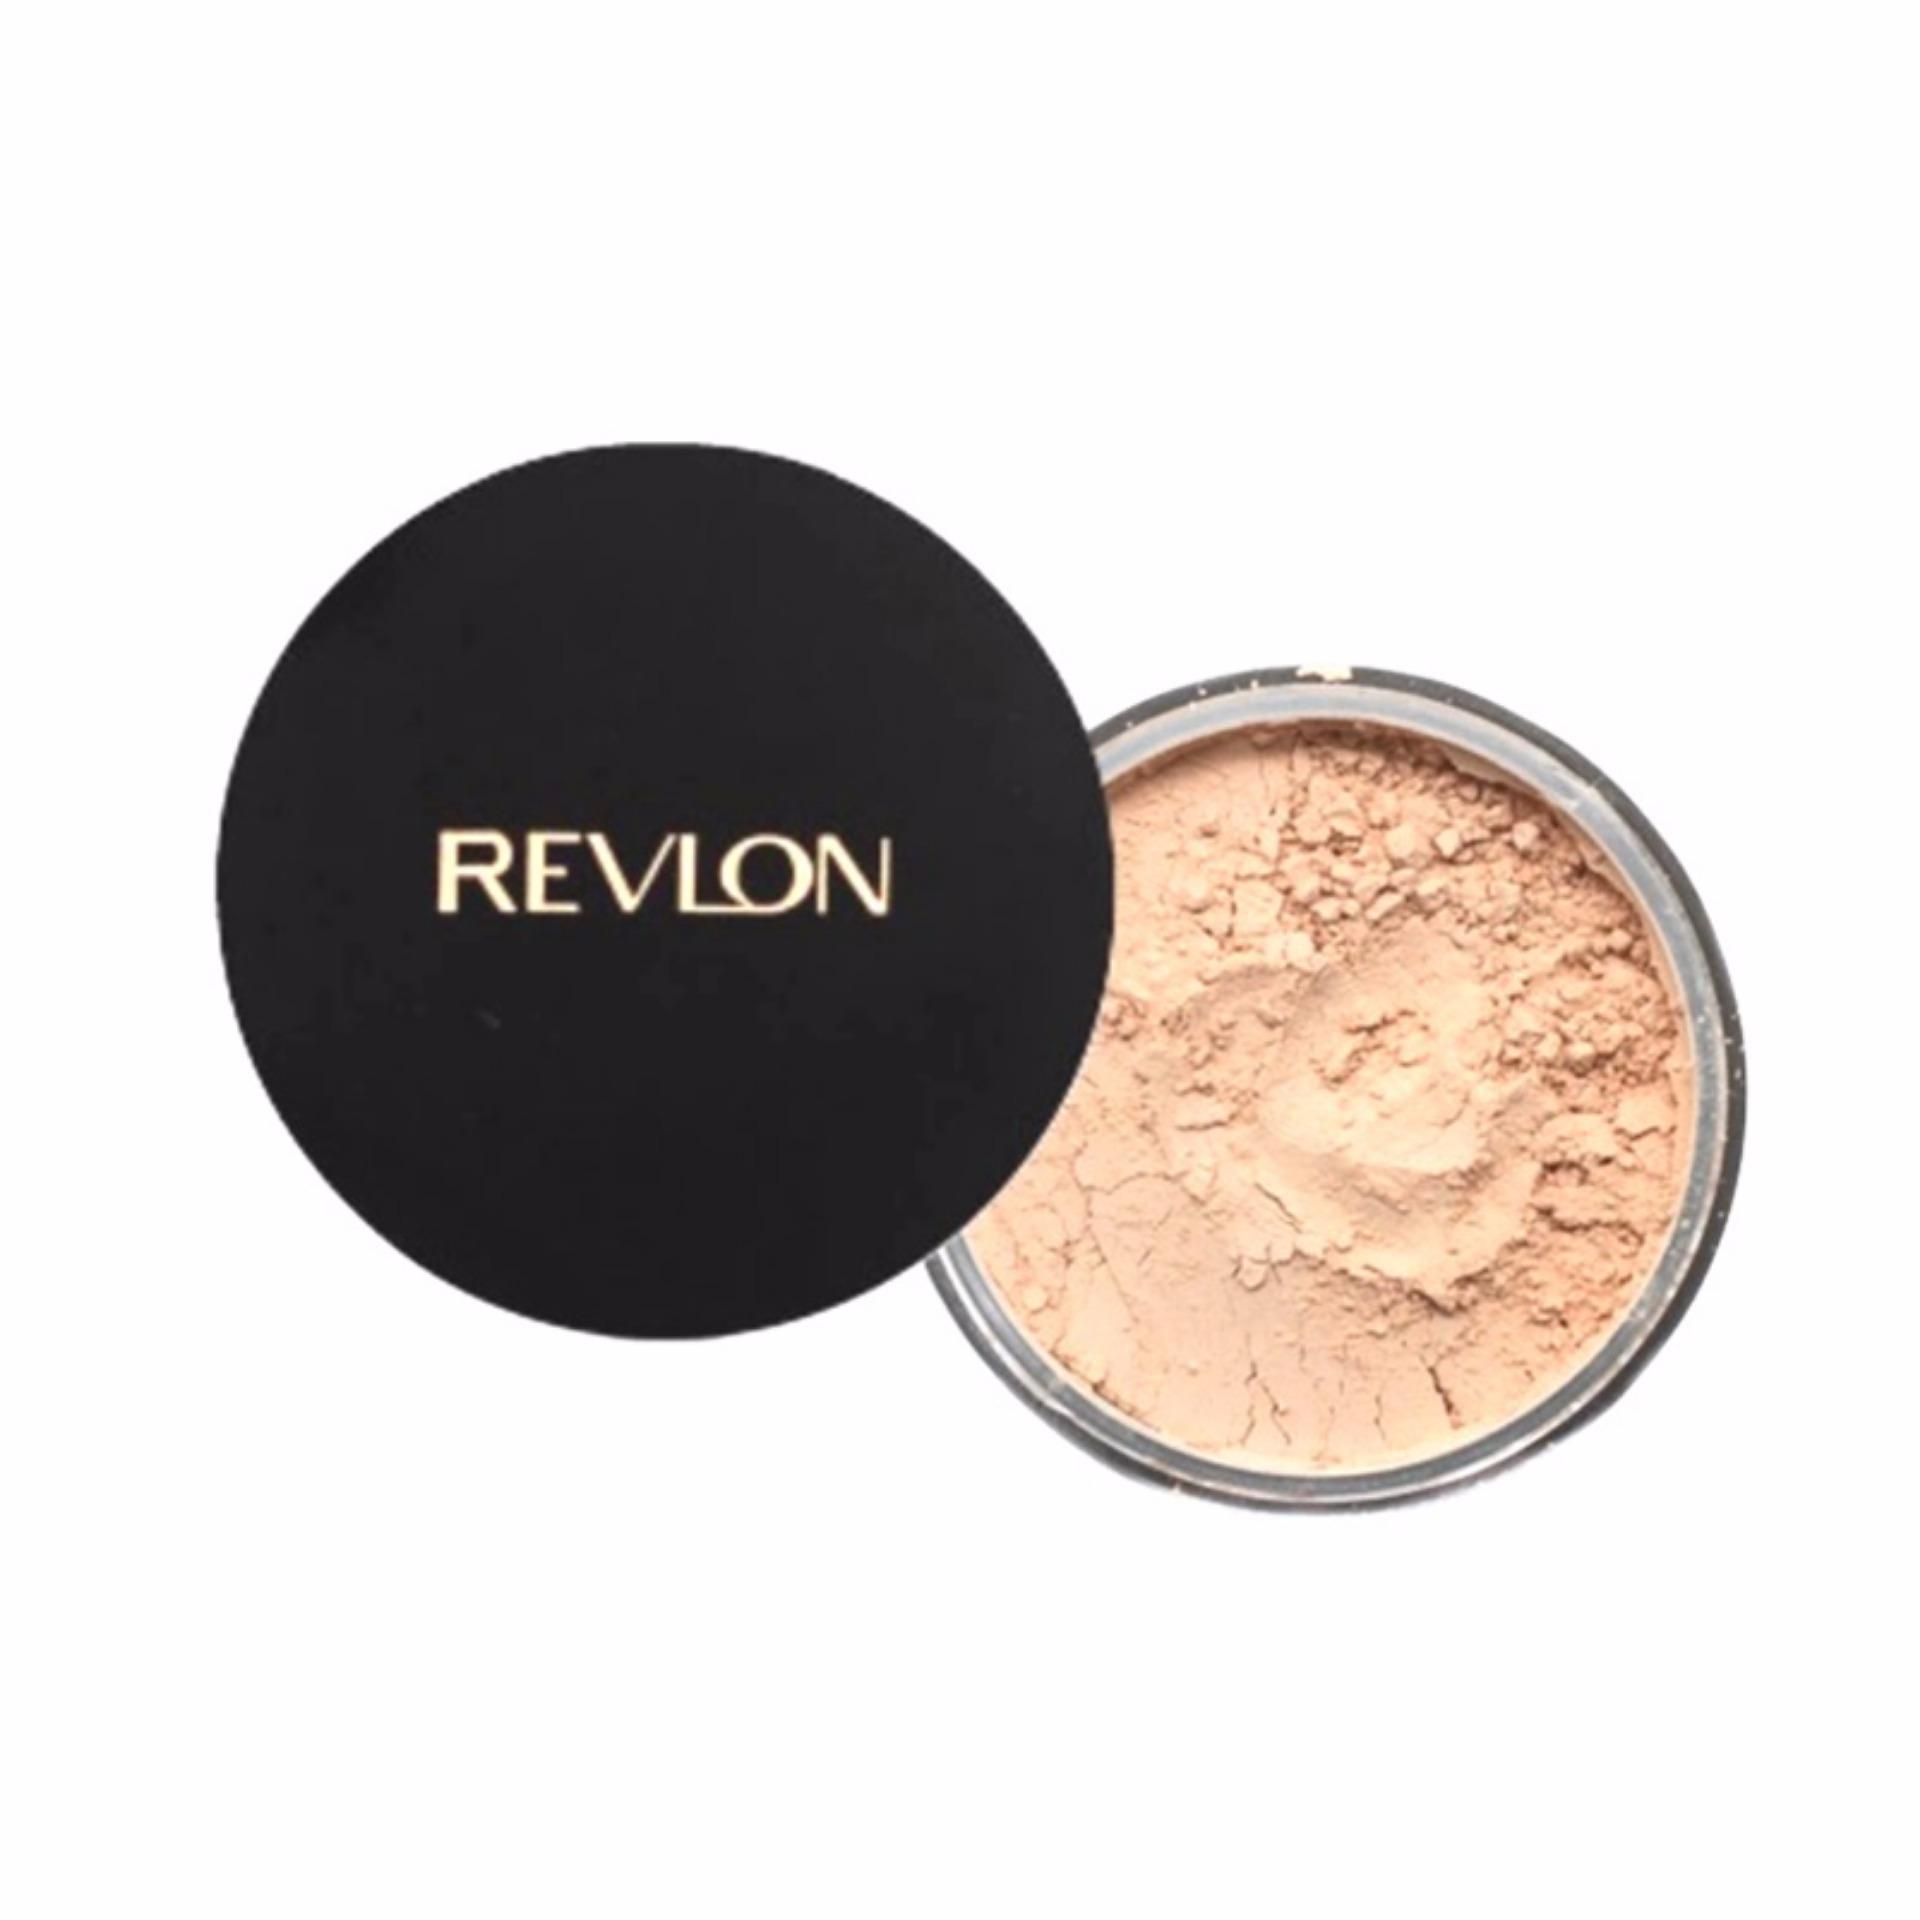 Bedak Compact Powder Bedak 2in1 Colorstay Gratis Power Banklist Source · Lembut Di Kulit Revlon Touch